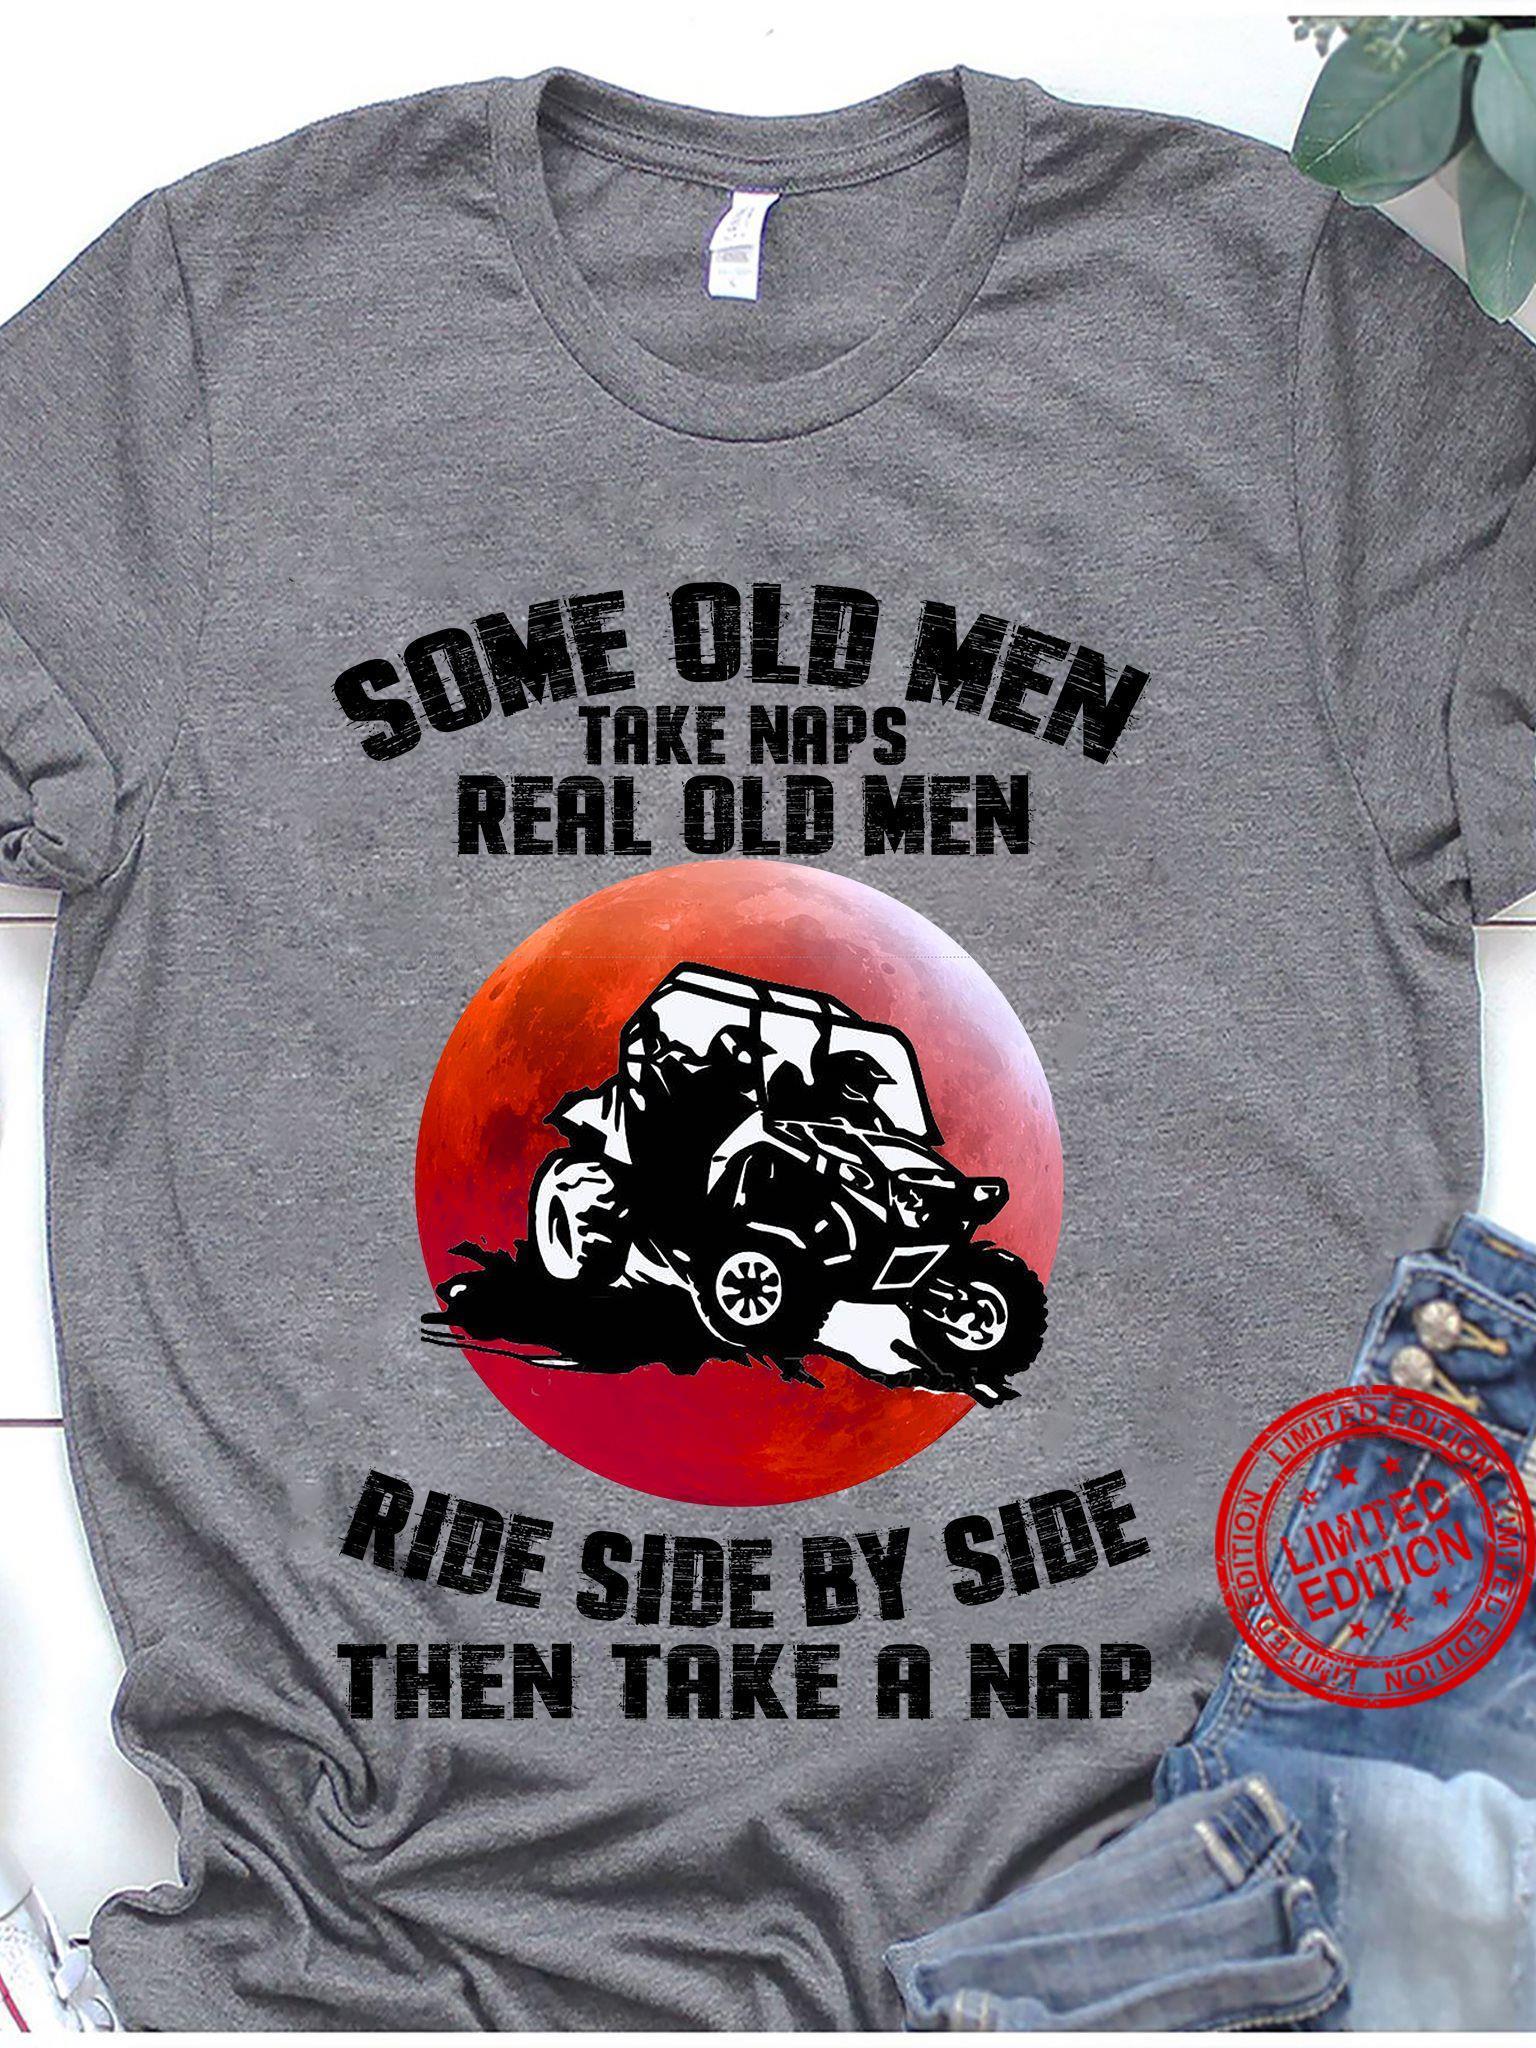 Some Old Men Take Naps Real Old Men Ride Side By Side Then Take A Nap Shirt